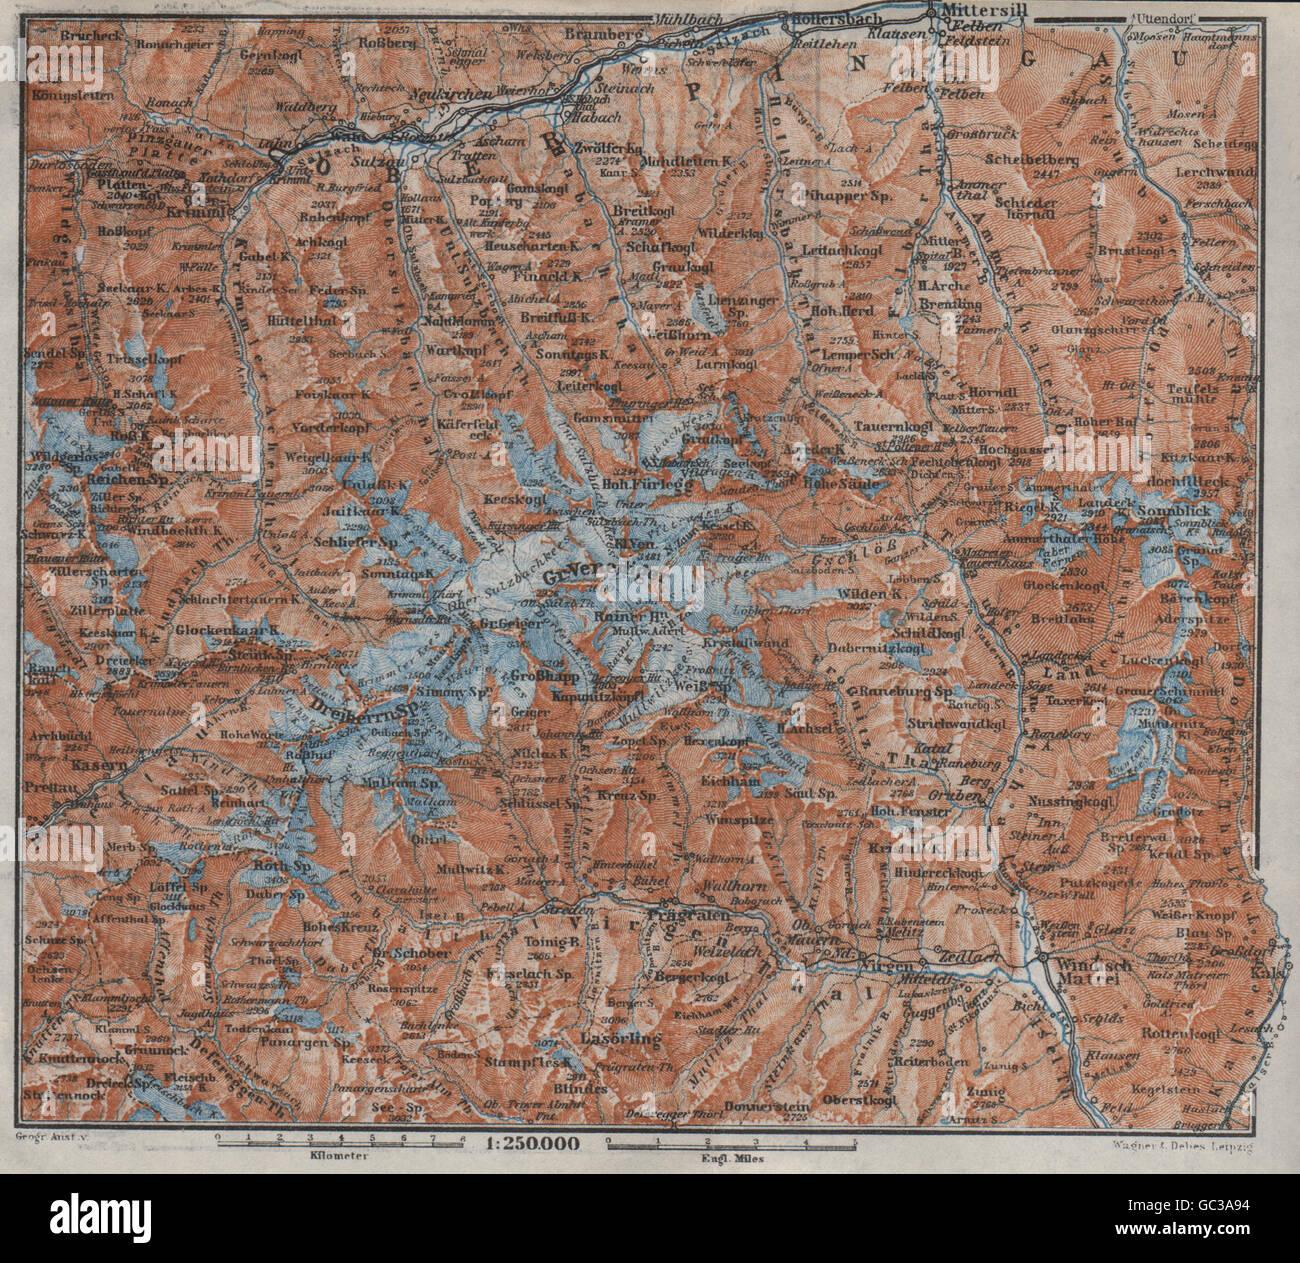 Hohe Tauern Karte.Venedigergruppe Oberpinzgau Hohe Tauern Mittersill Prägraten